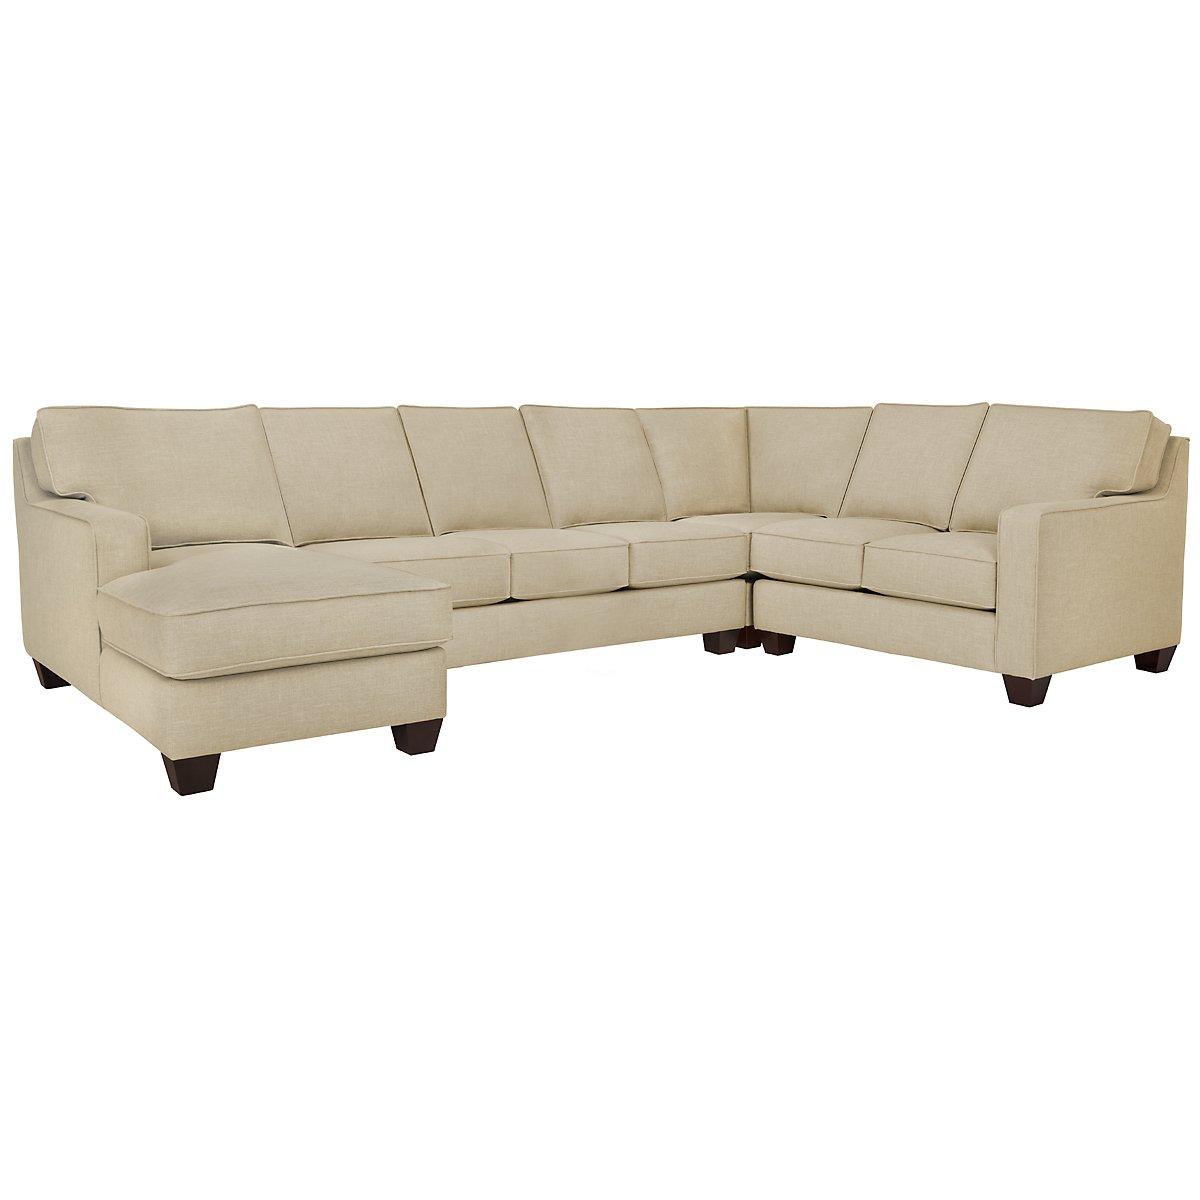 Madrid Taupe Beige Ultra Modern Living Room Furniture 3: York Beige Fabric Left Chaise Innerspring Sleeper Sectional